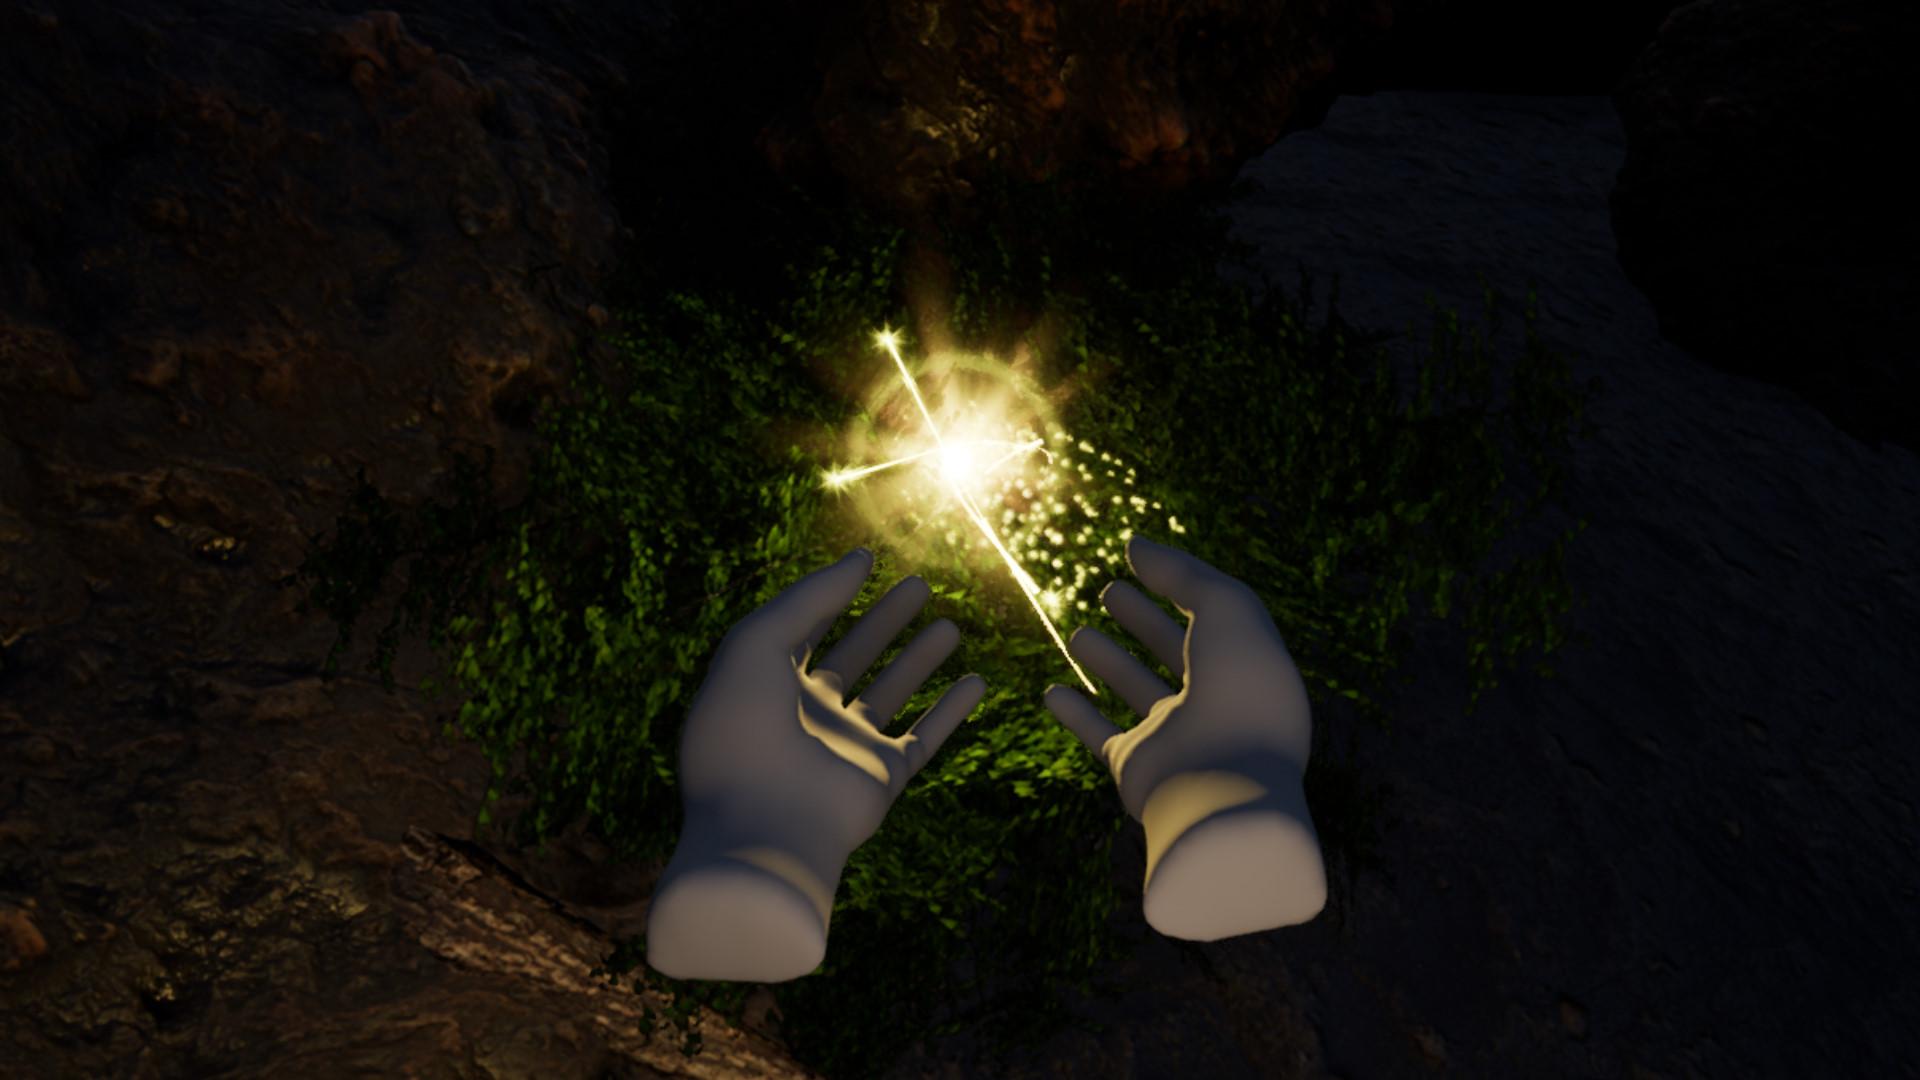 Internal Light VR gets Steam release